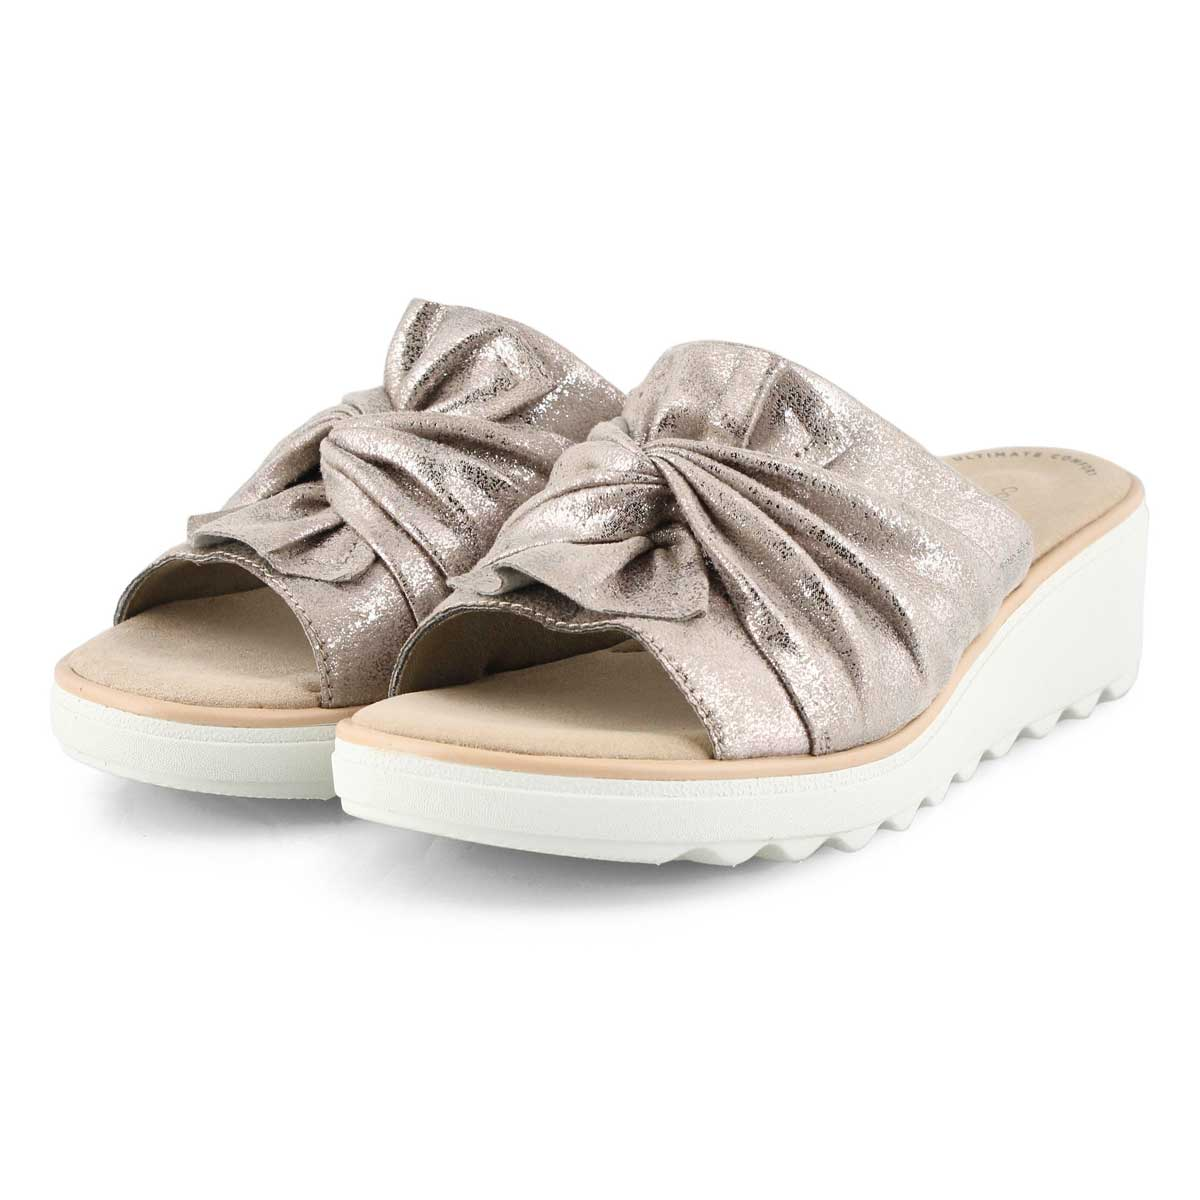 Lds Jillian Leap pewter wedge sandal